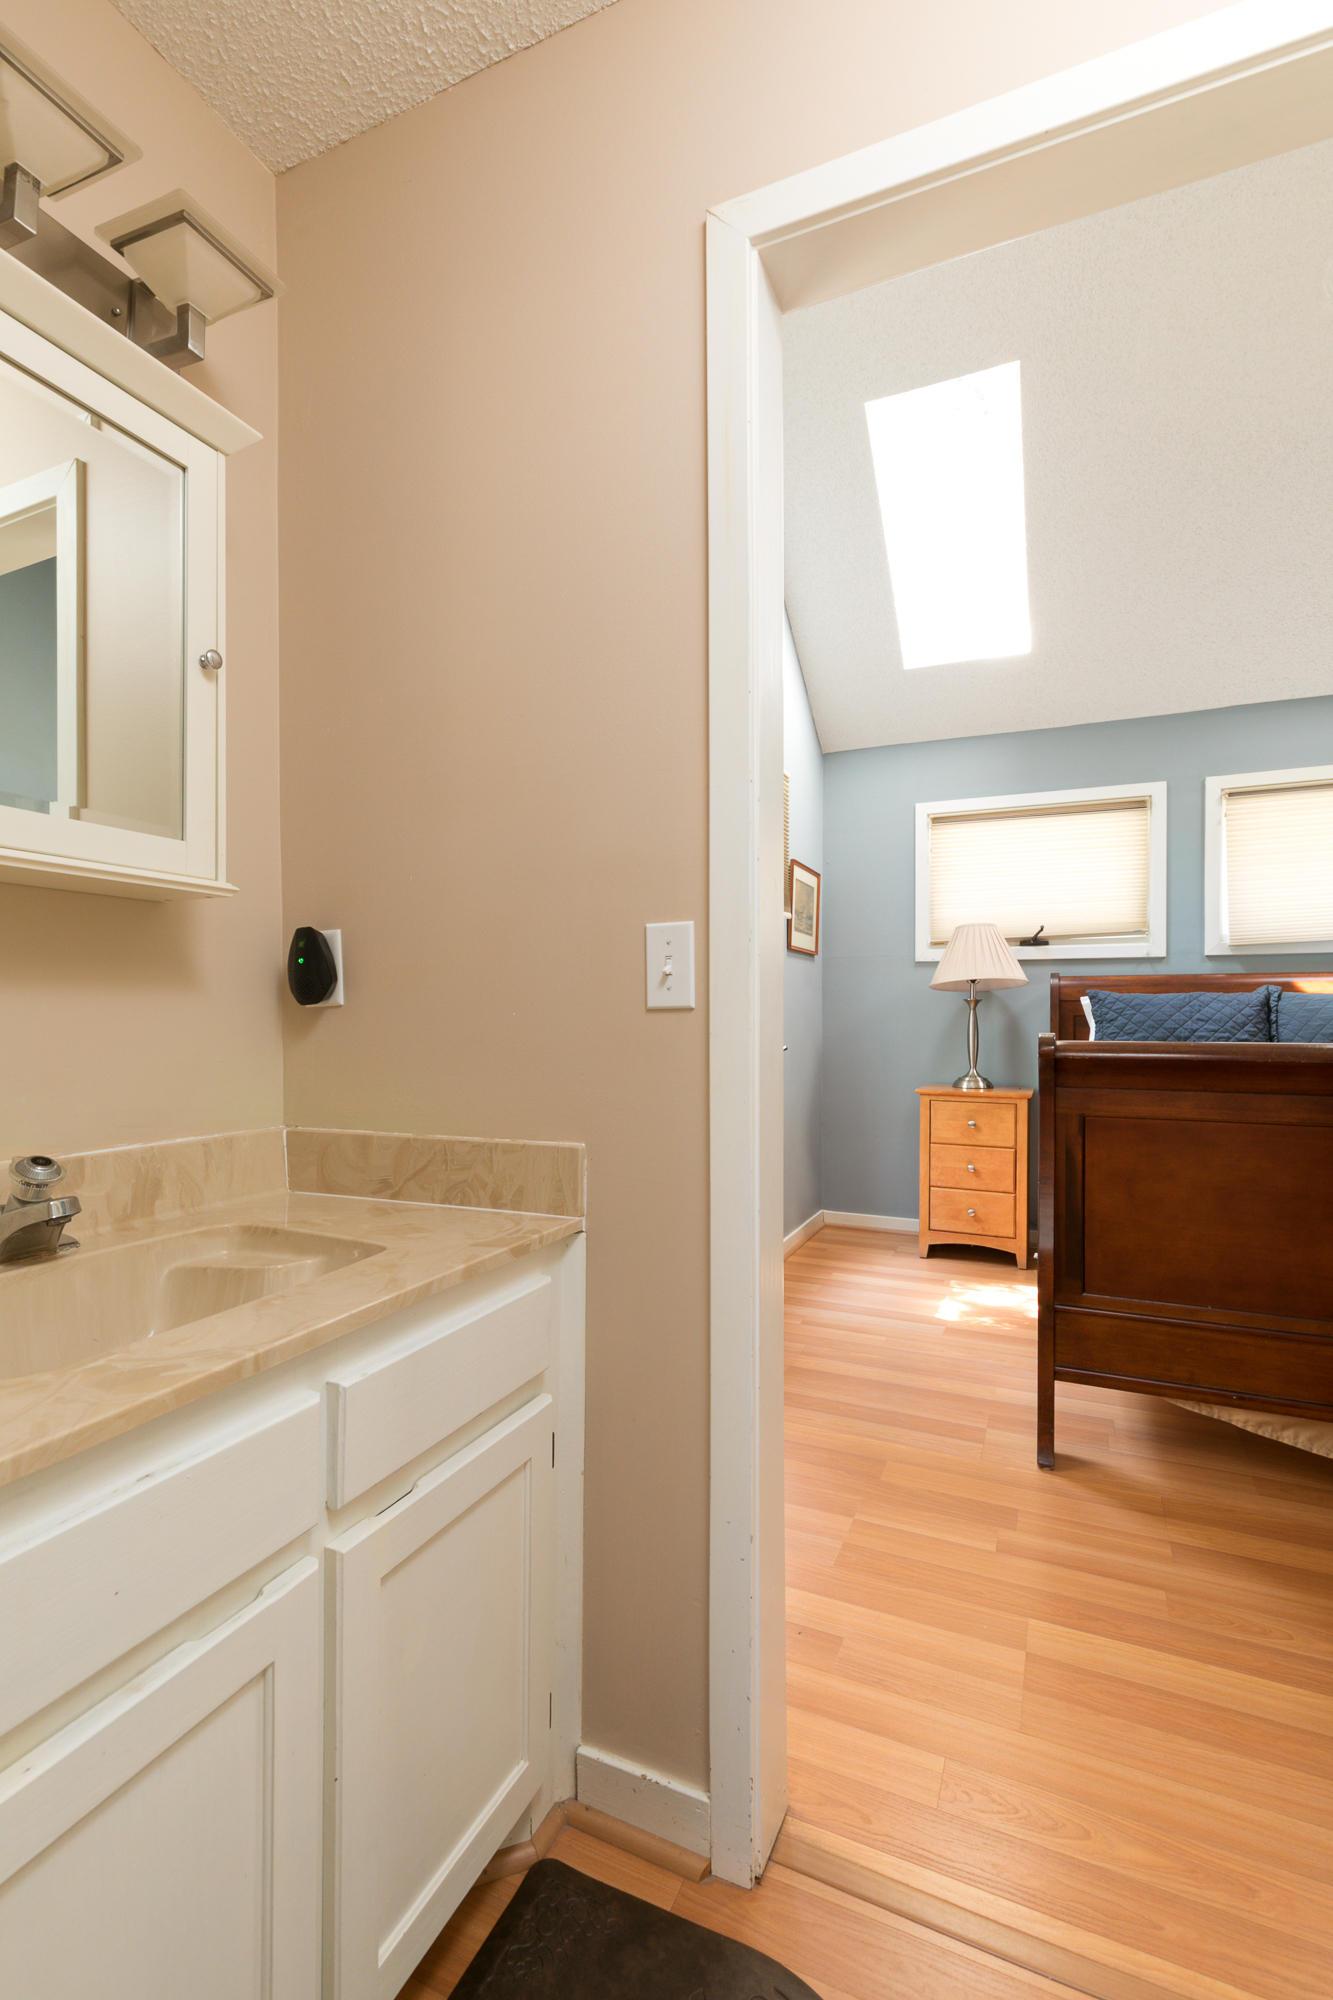 Seabrook Island Homes For Sale - 3080 Marshgate, Seabrook Island, SC - 15